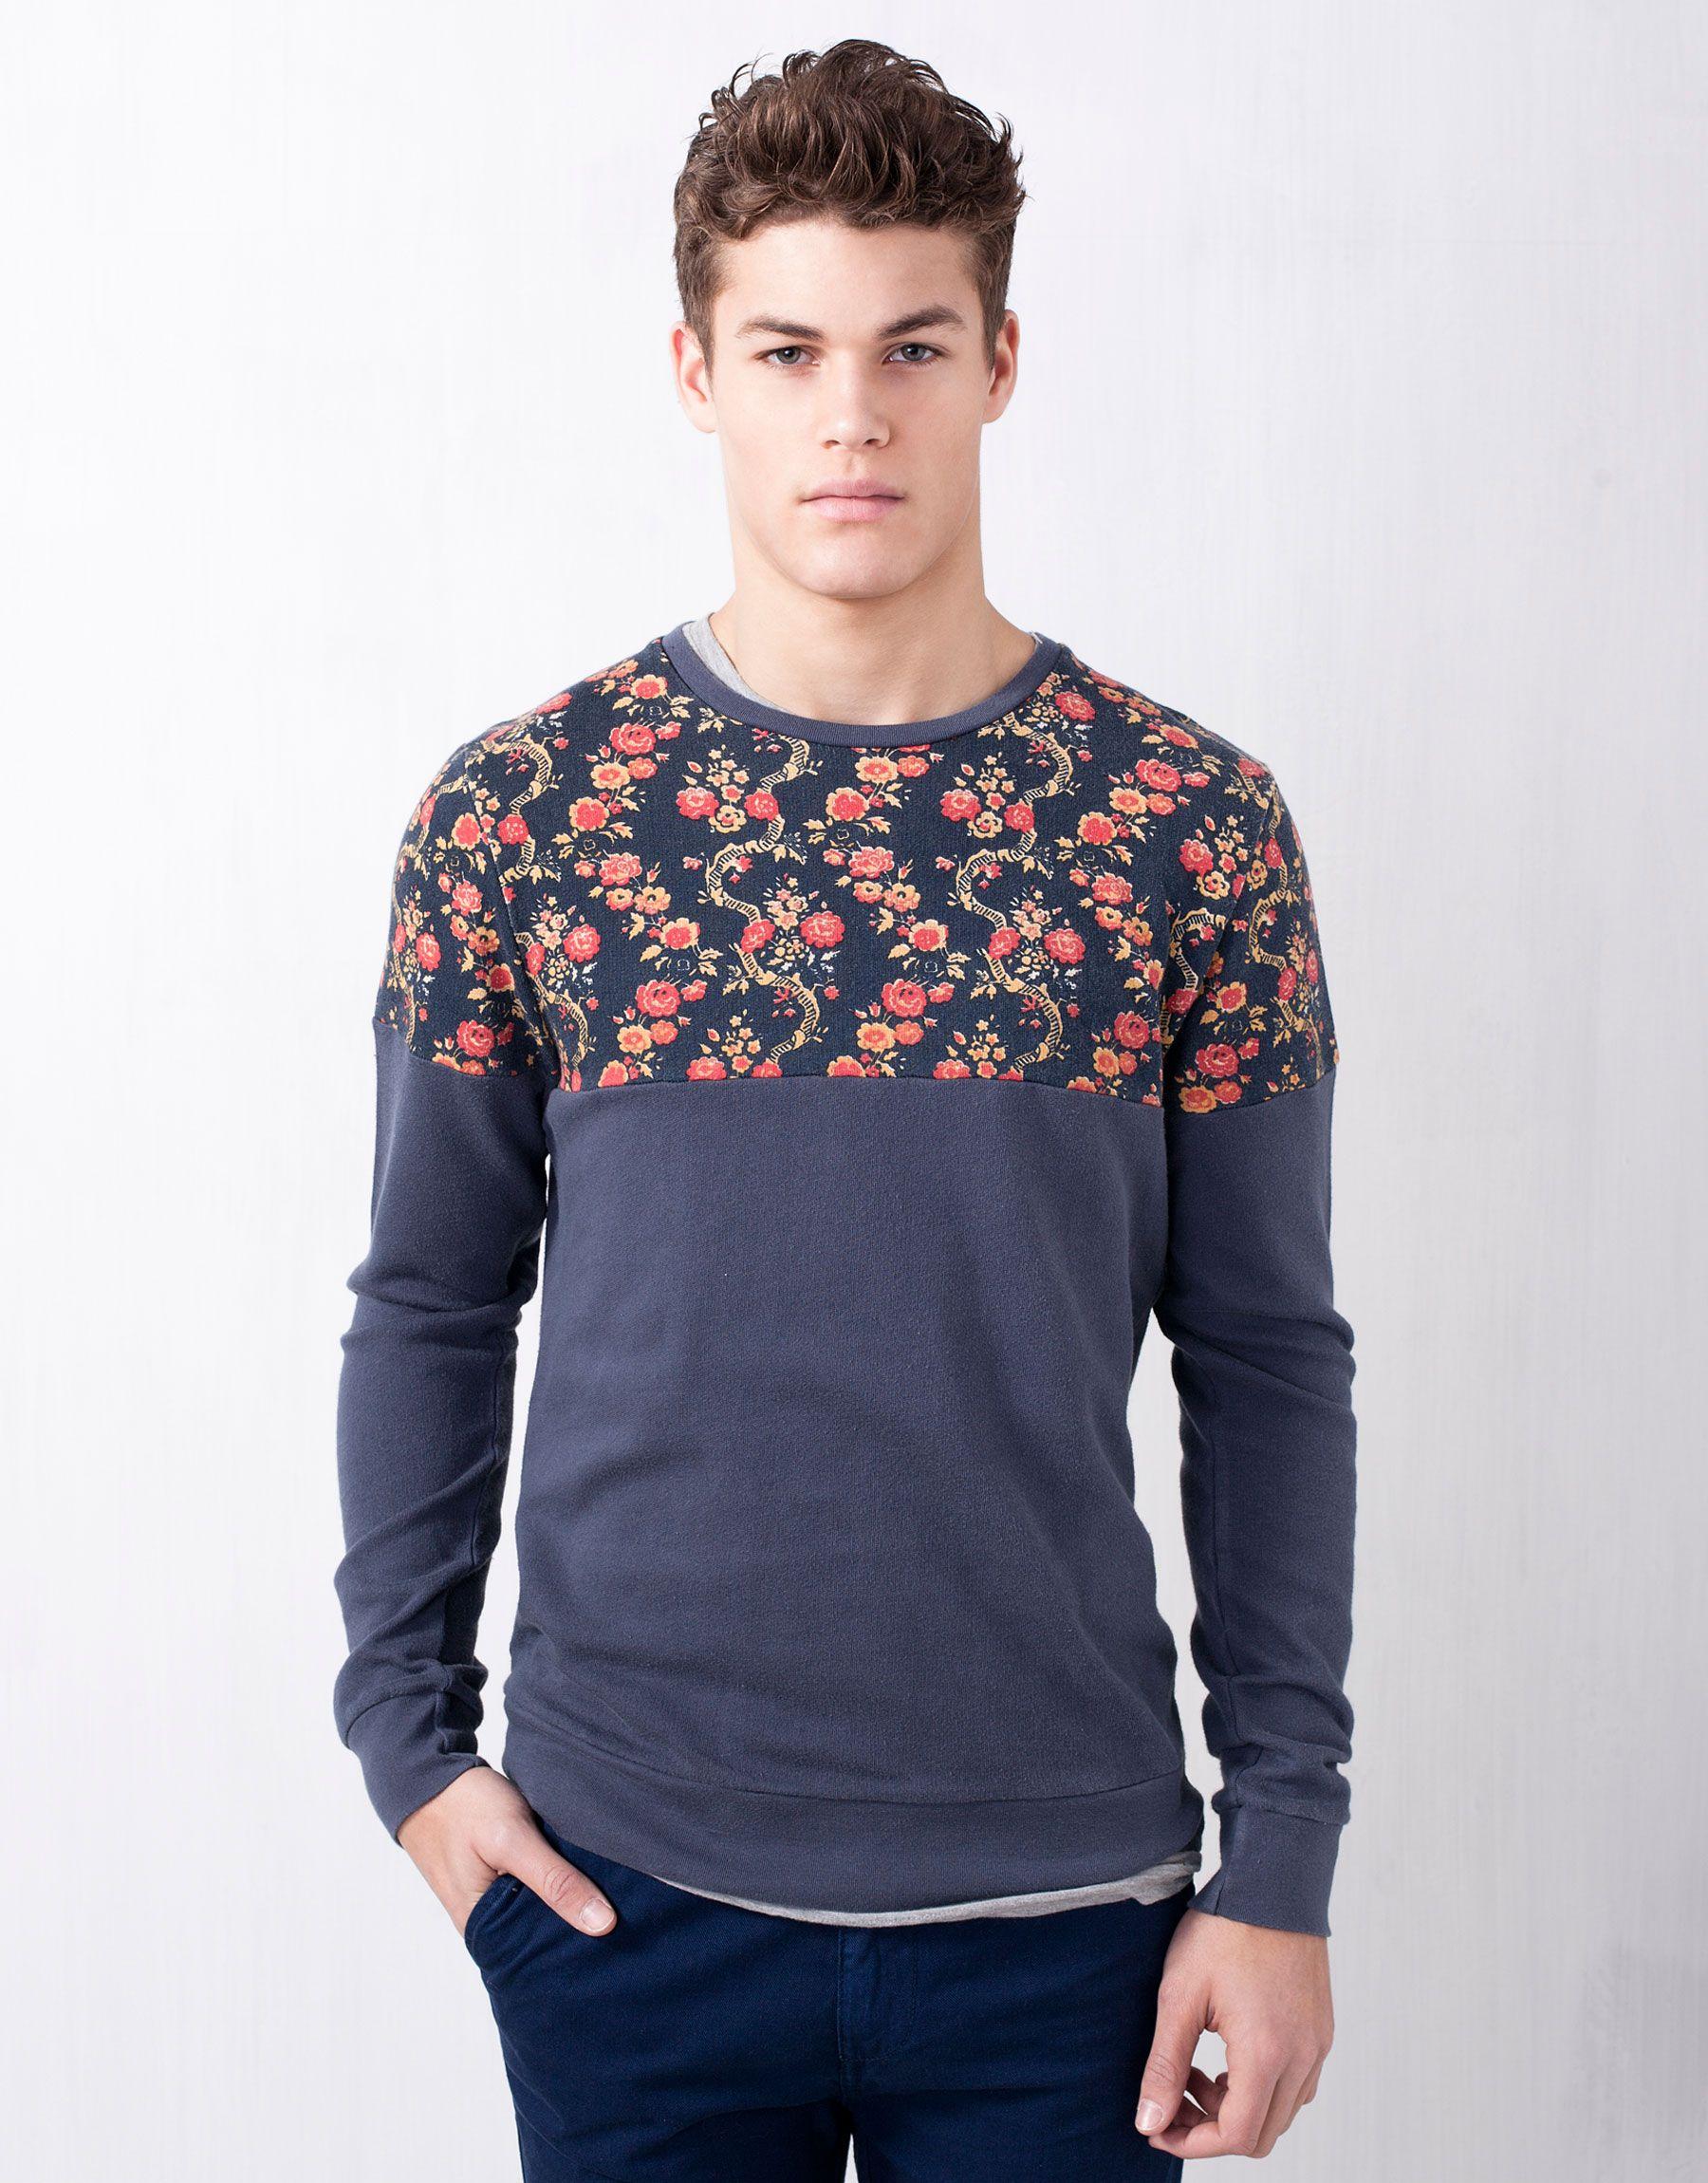 Sweatshirts Man Pull Bear Hungary Ropa De Hombre Sudaderas Ropa